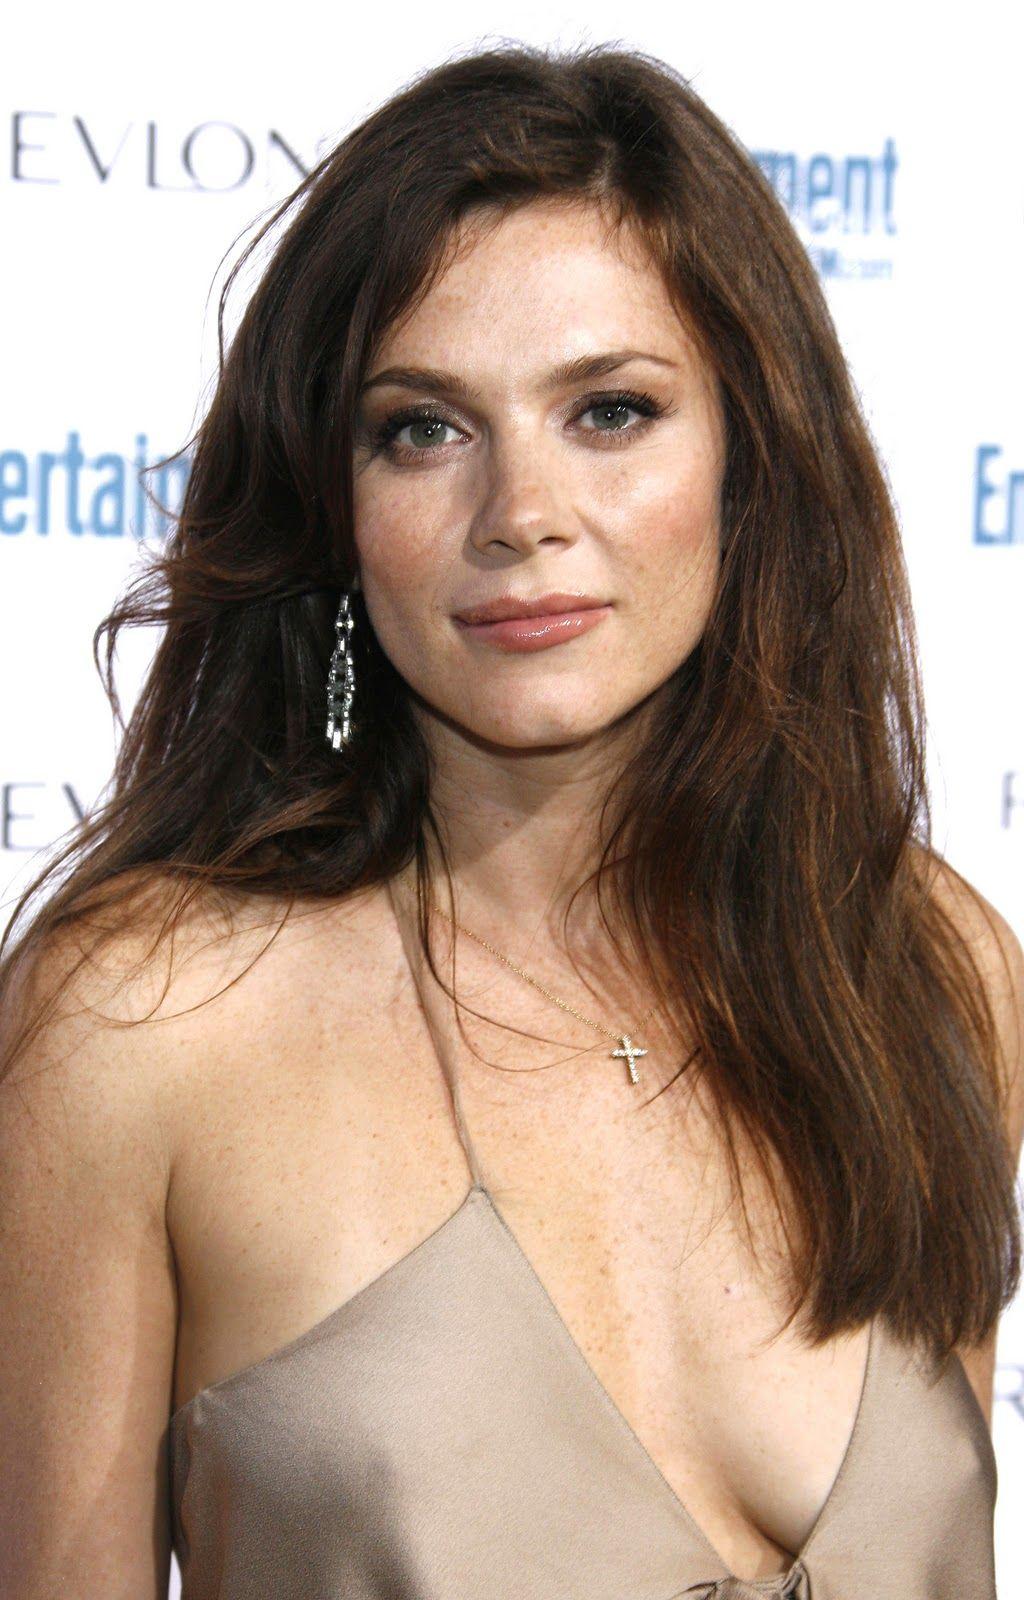 Anna Friel (born 1976)